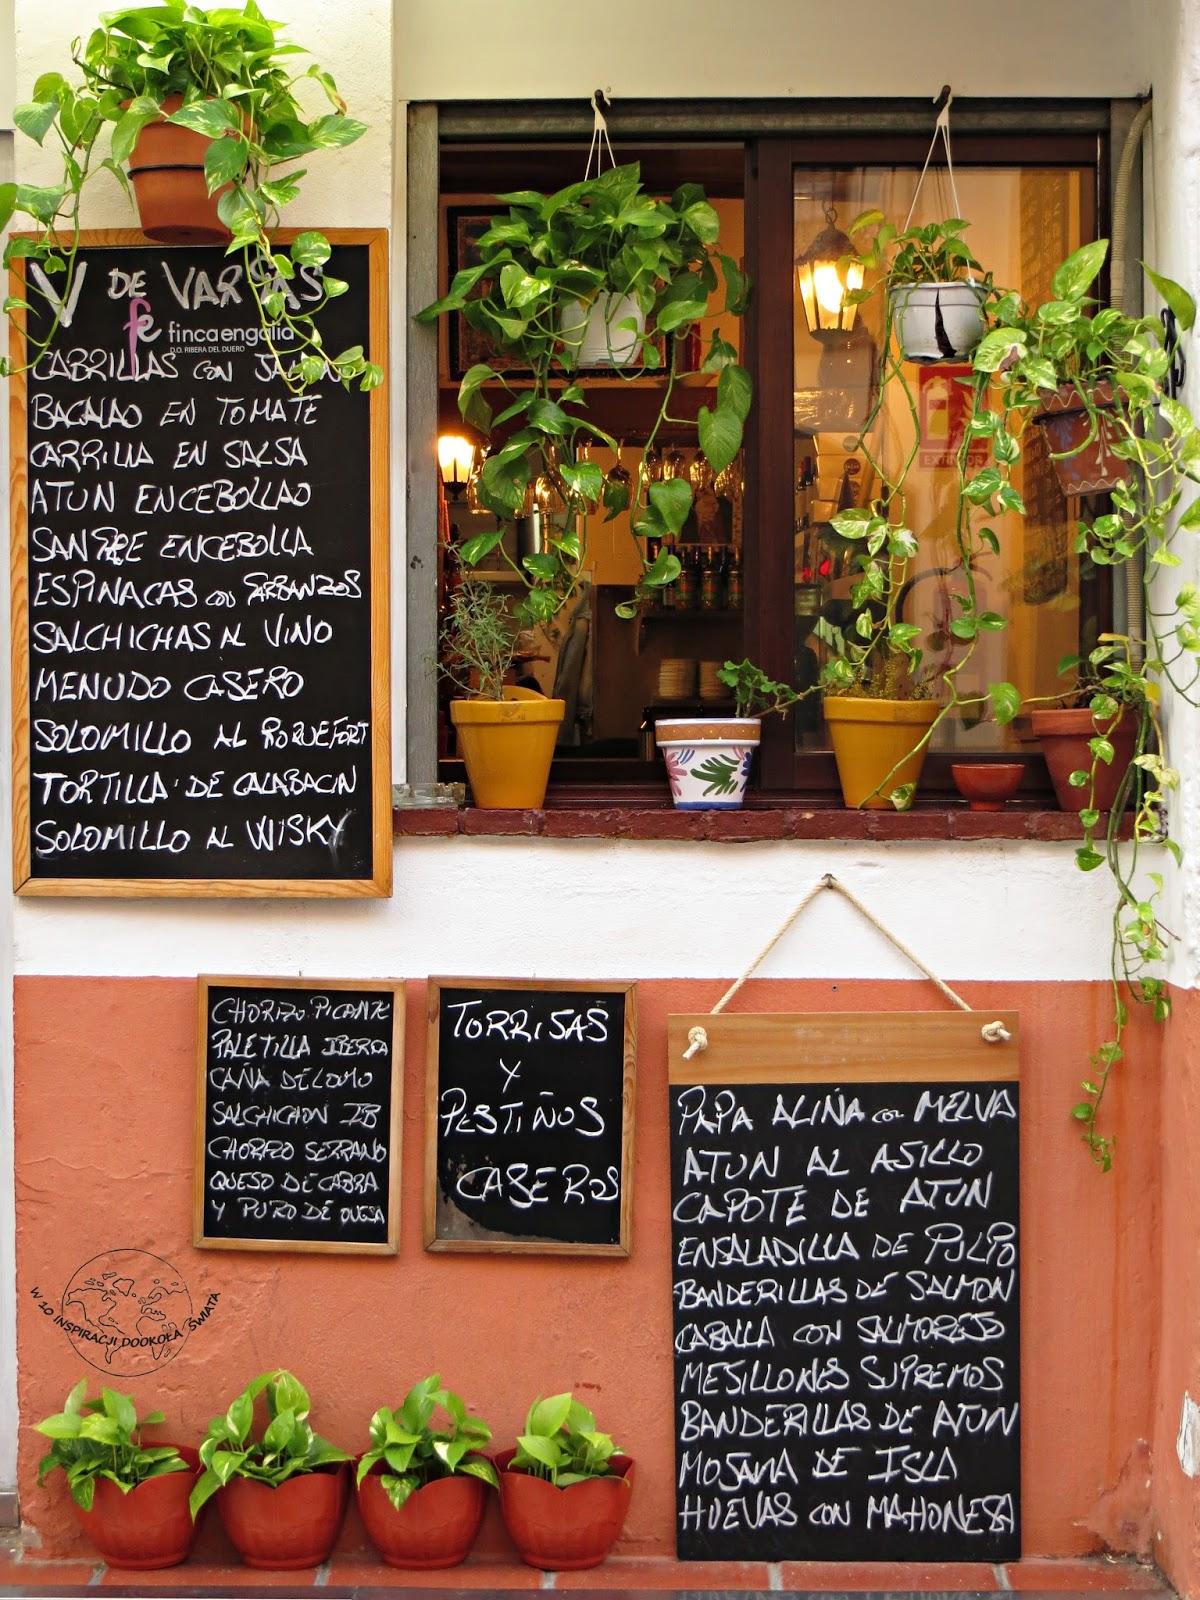 Hiszpania - Andaluzja - kuchnie świata. Autorka: Magda Delkowska